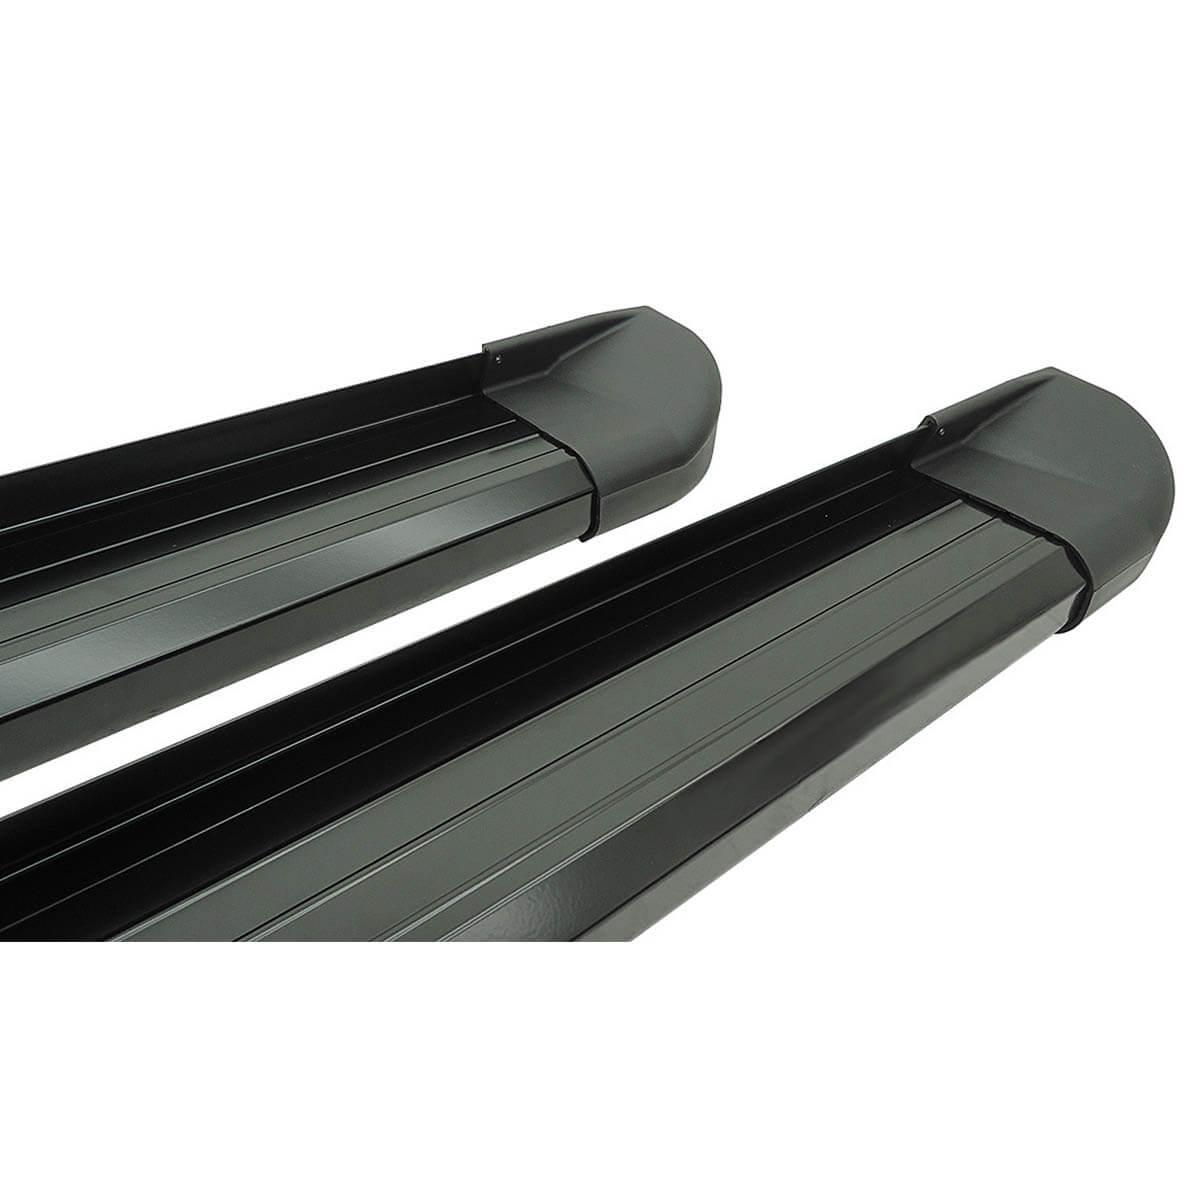 Estribo plataforma alumínio preto Hilux cabine dupla 2005 a 2015